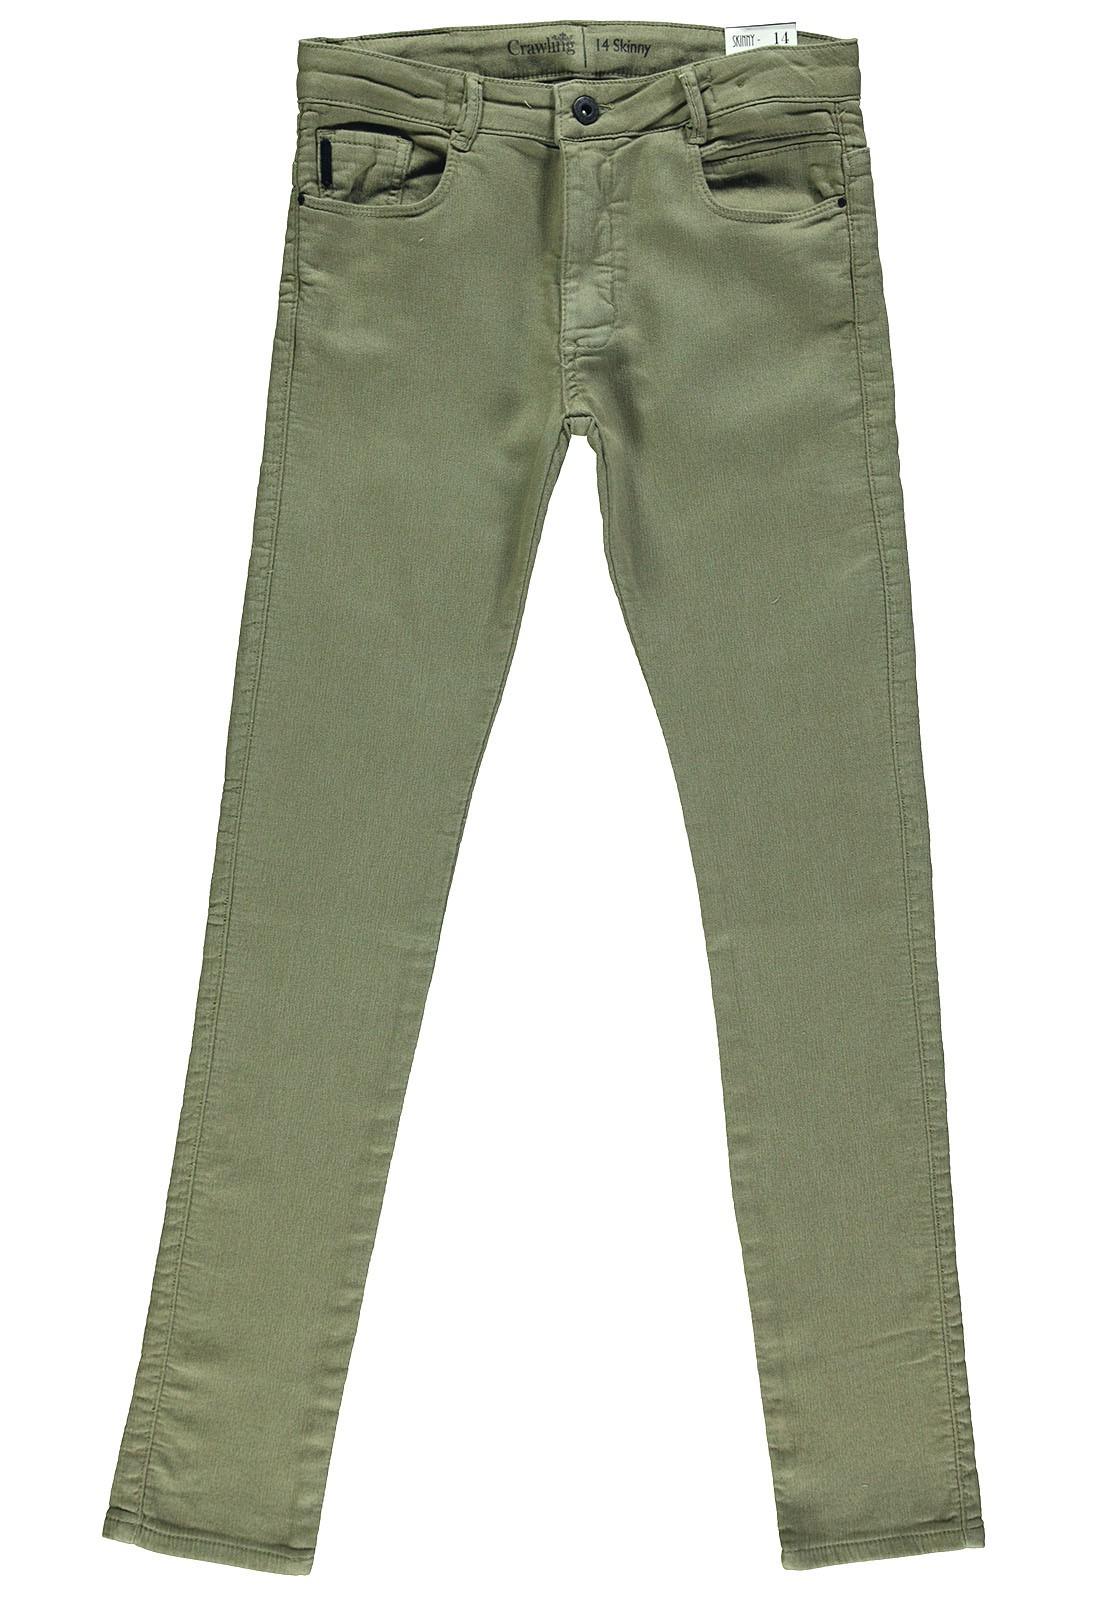 Calça Sarja Moletom Crawling Masculina Skinny Verde Militar